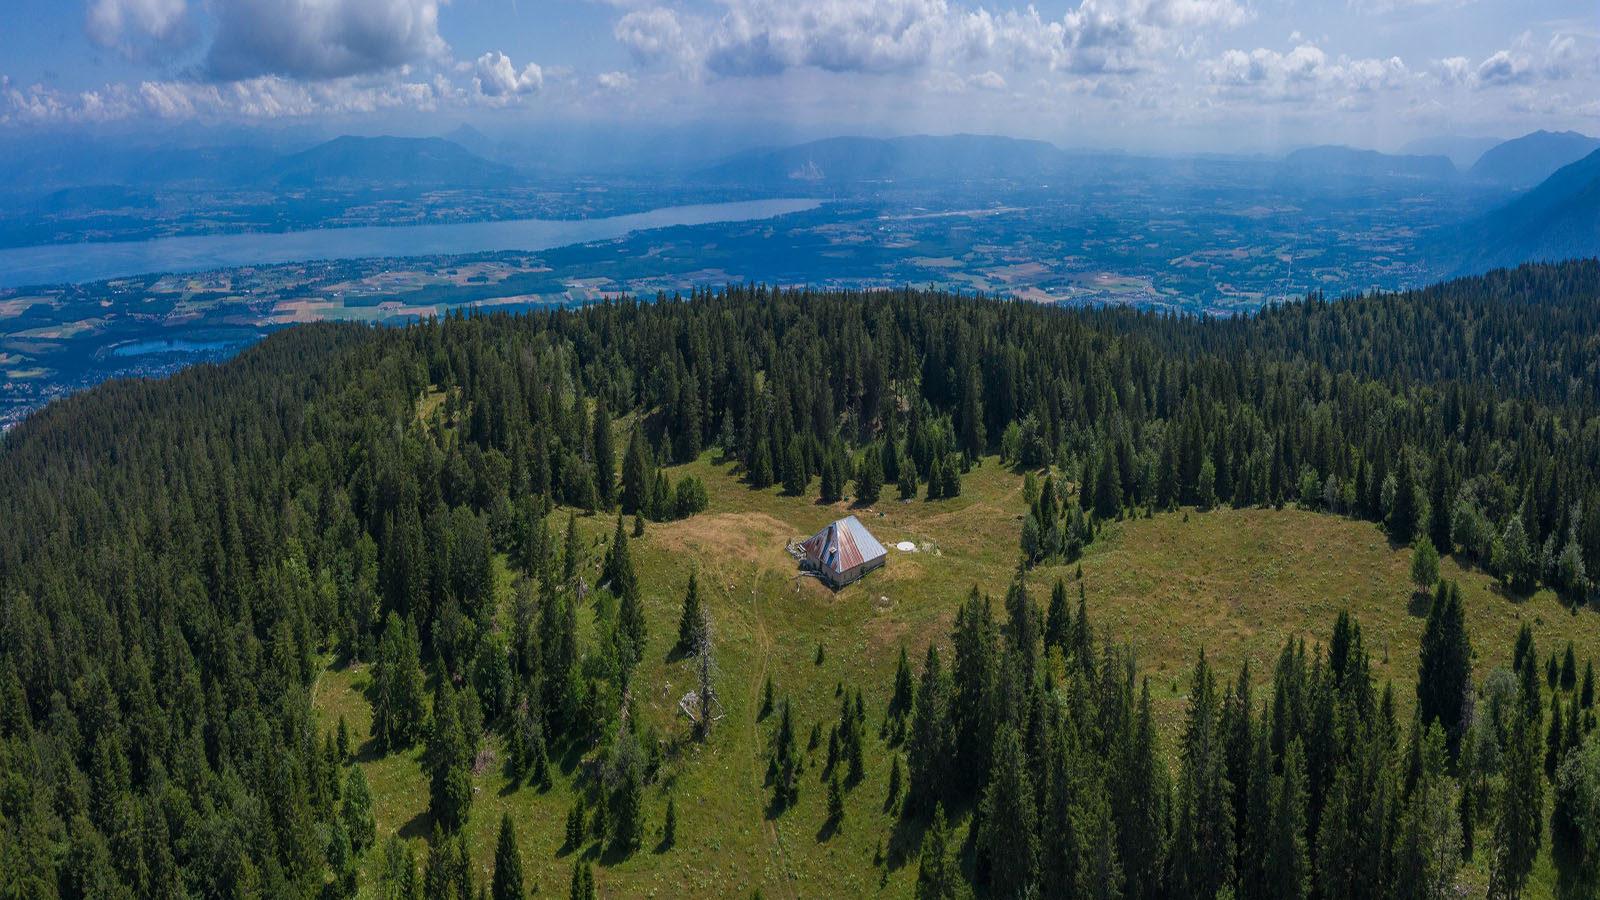 L'habitat rural de la haute vallée de la Valserine